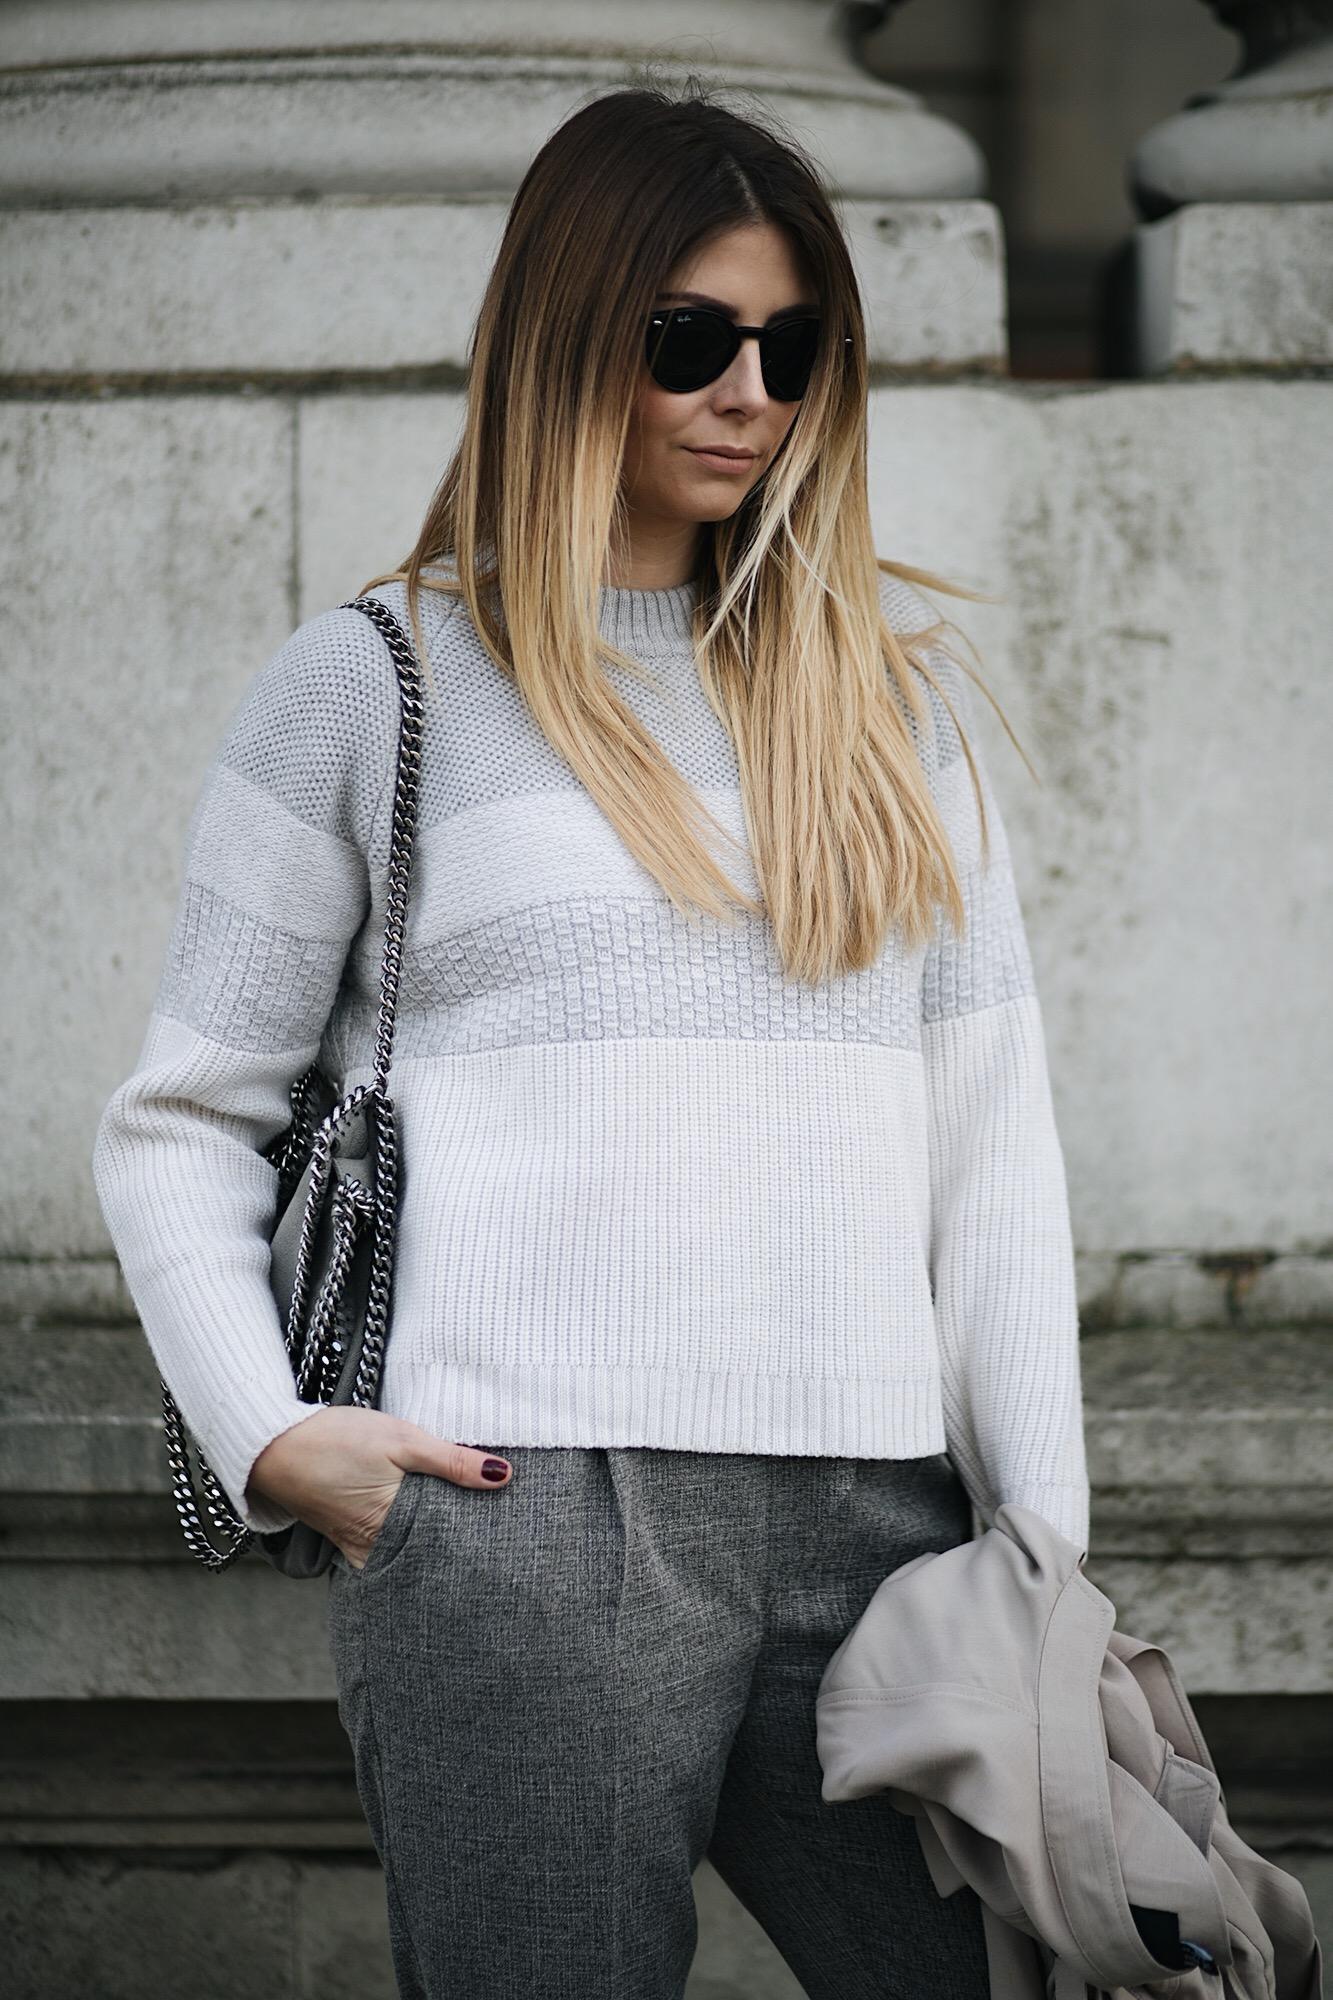 grey white stripe wool jumper, grey stella McCartney Falabella bag, tailored trousers, long blonde hair